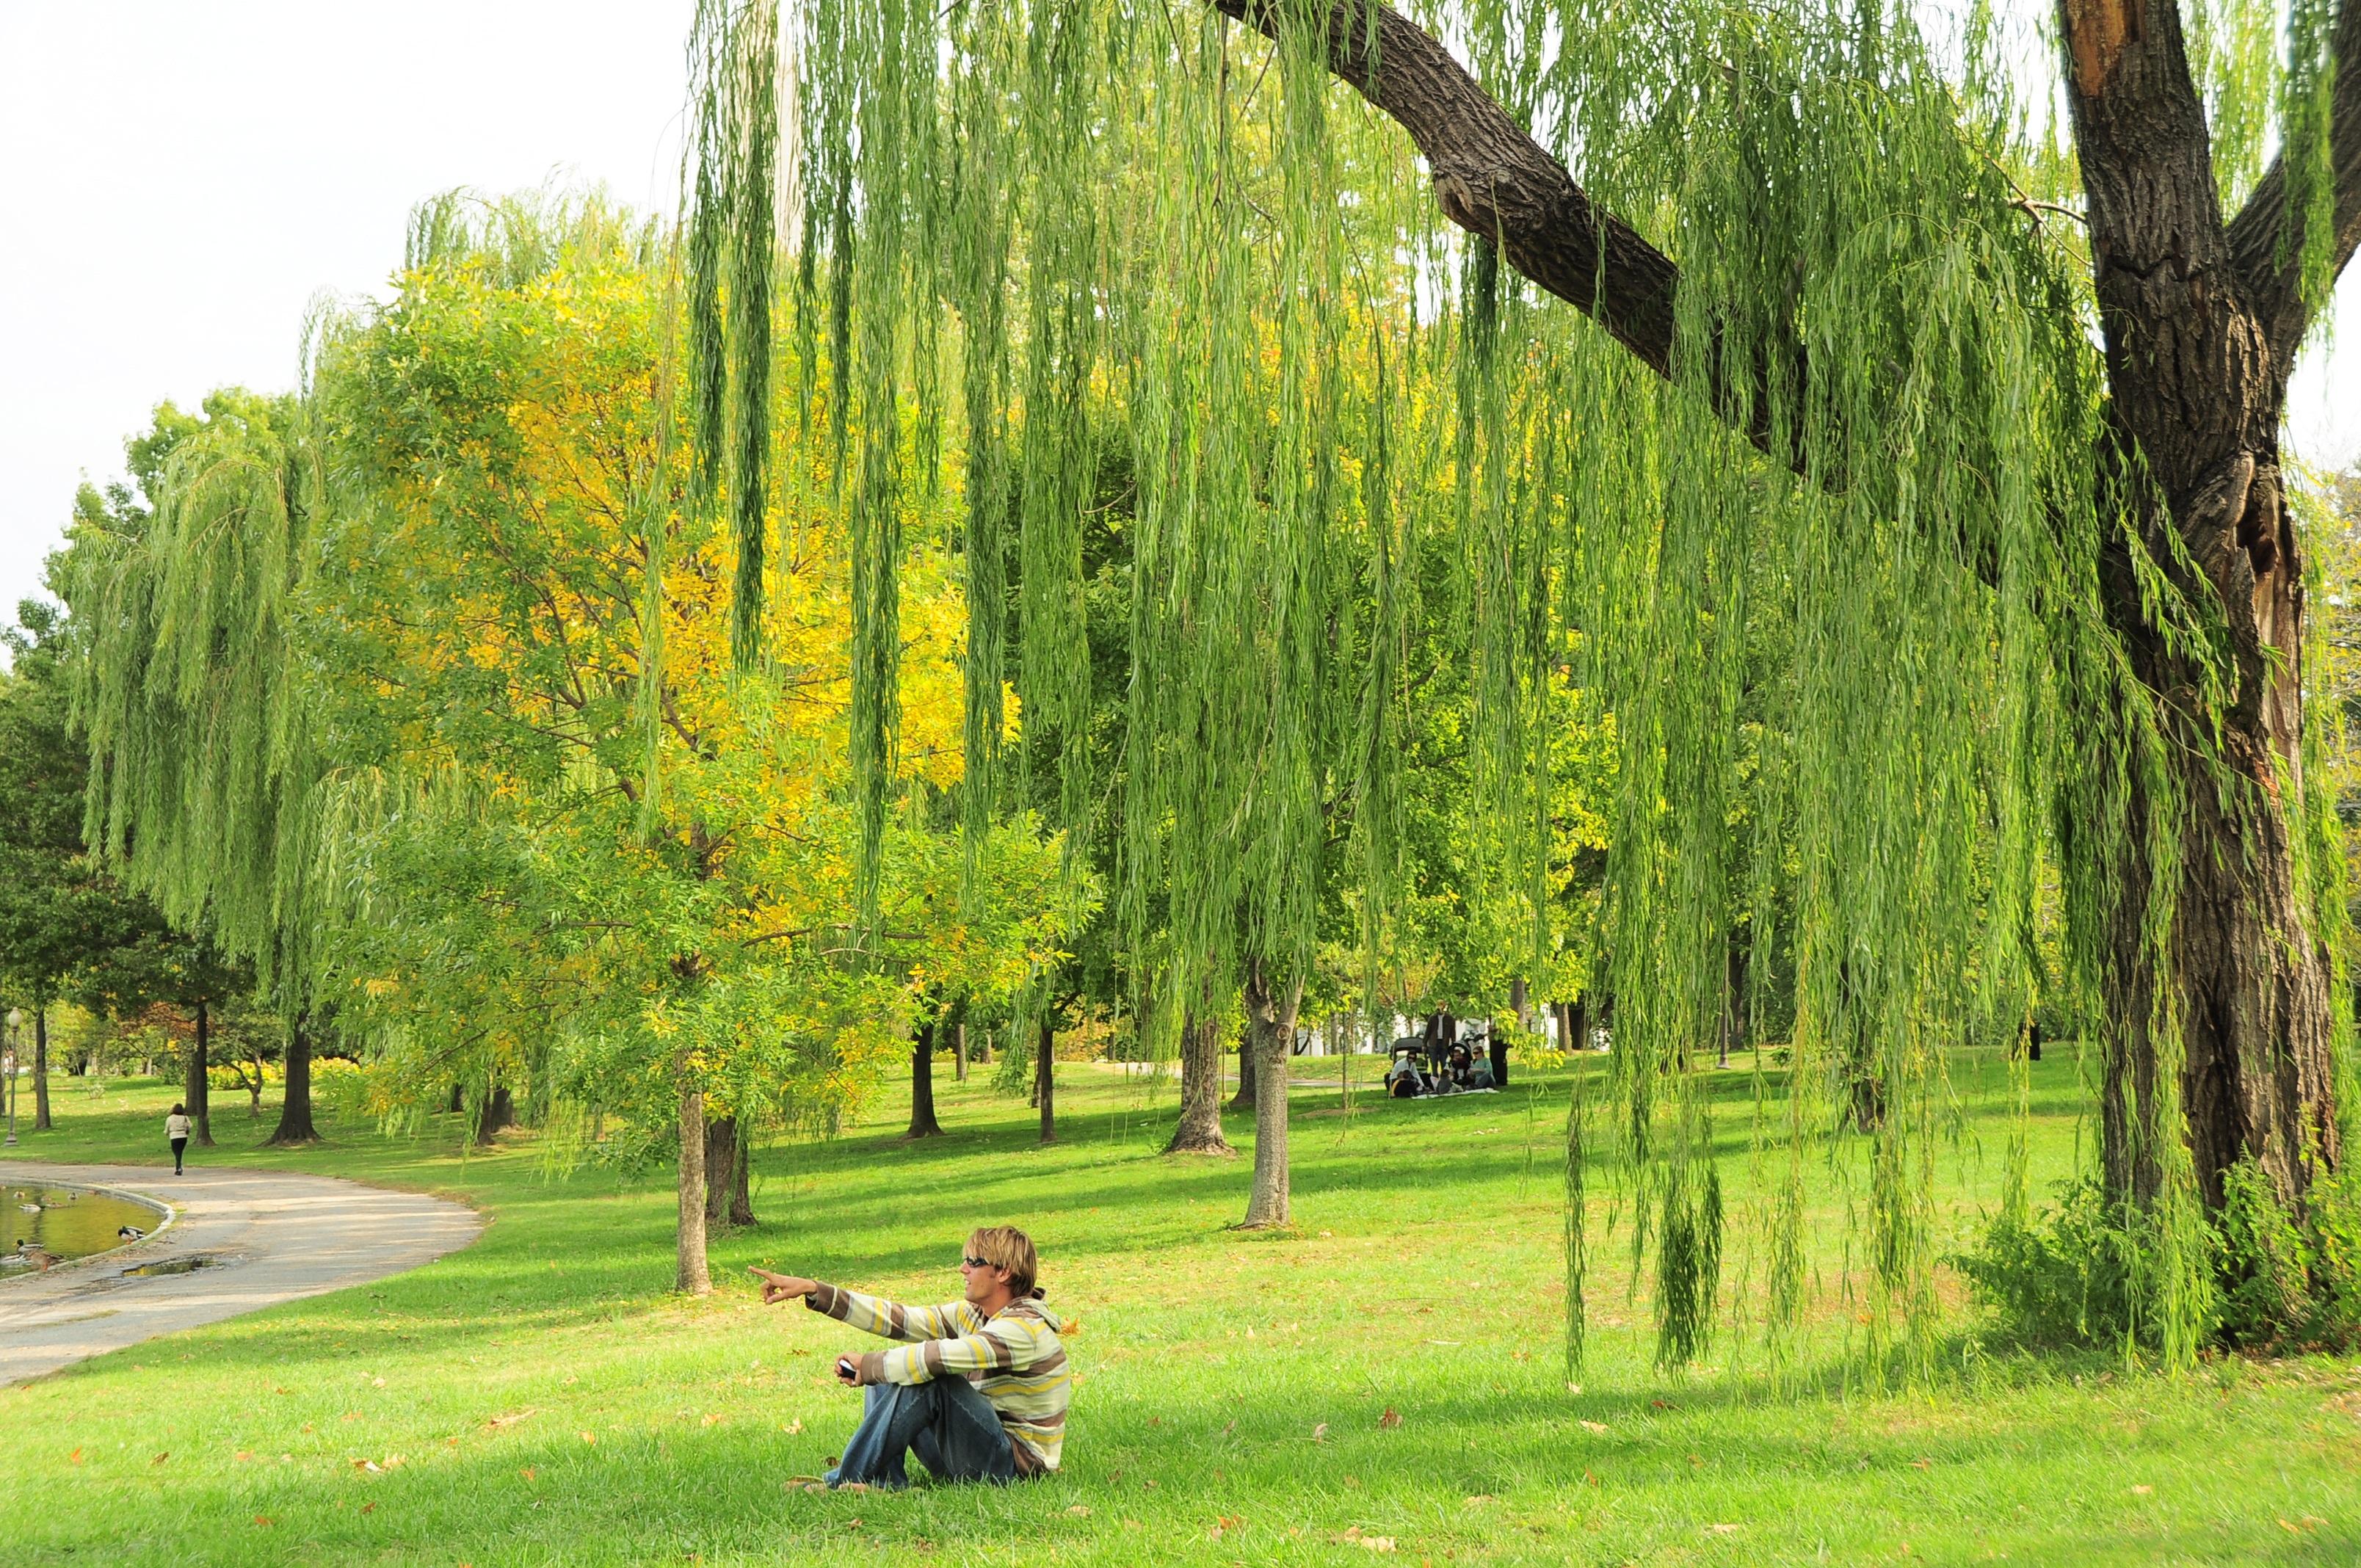 Bois de saule synonyme for Plante synonyme